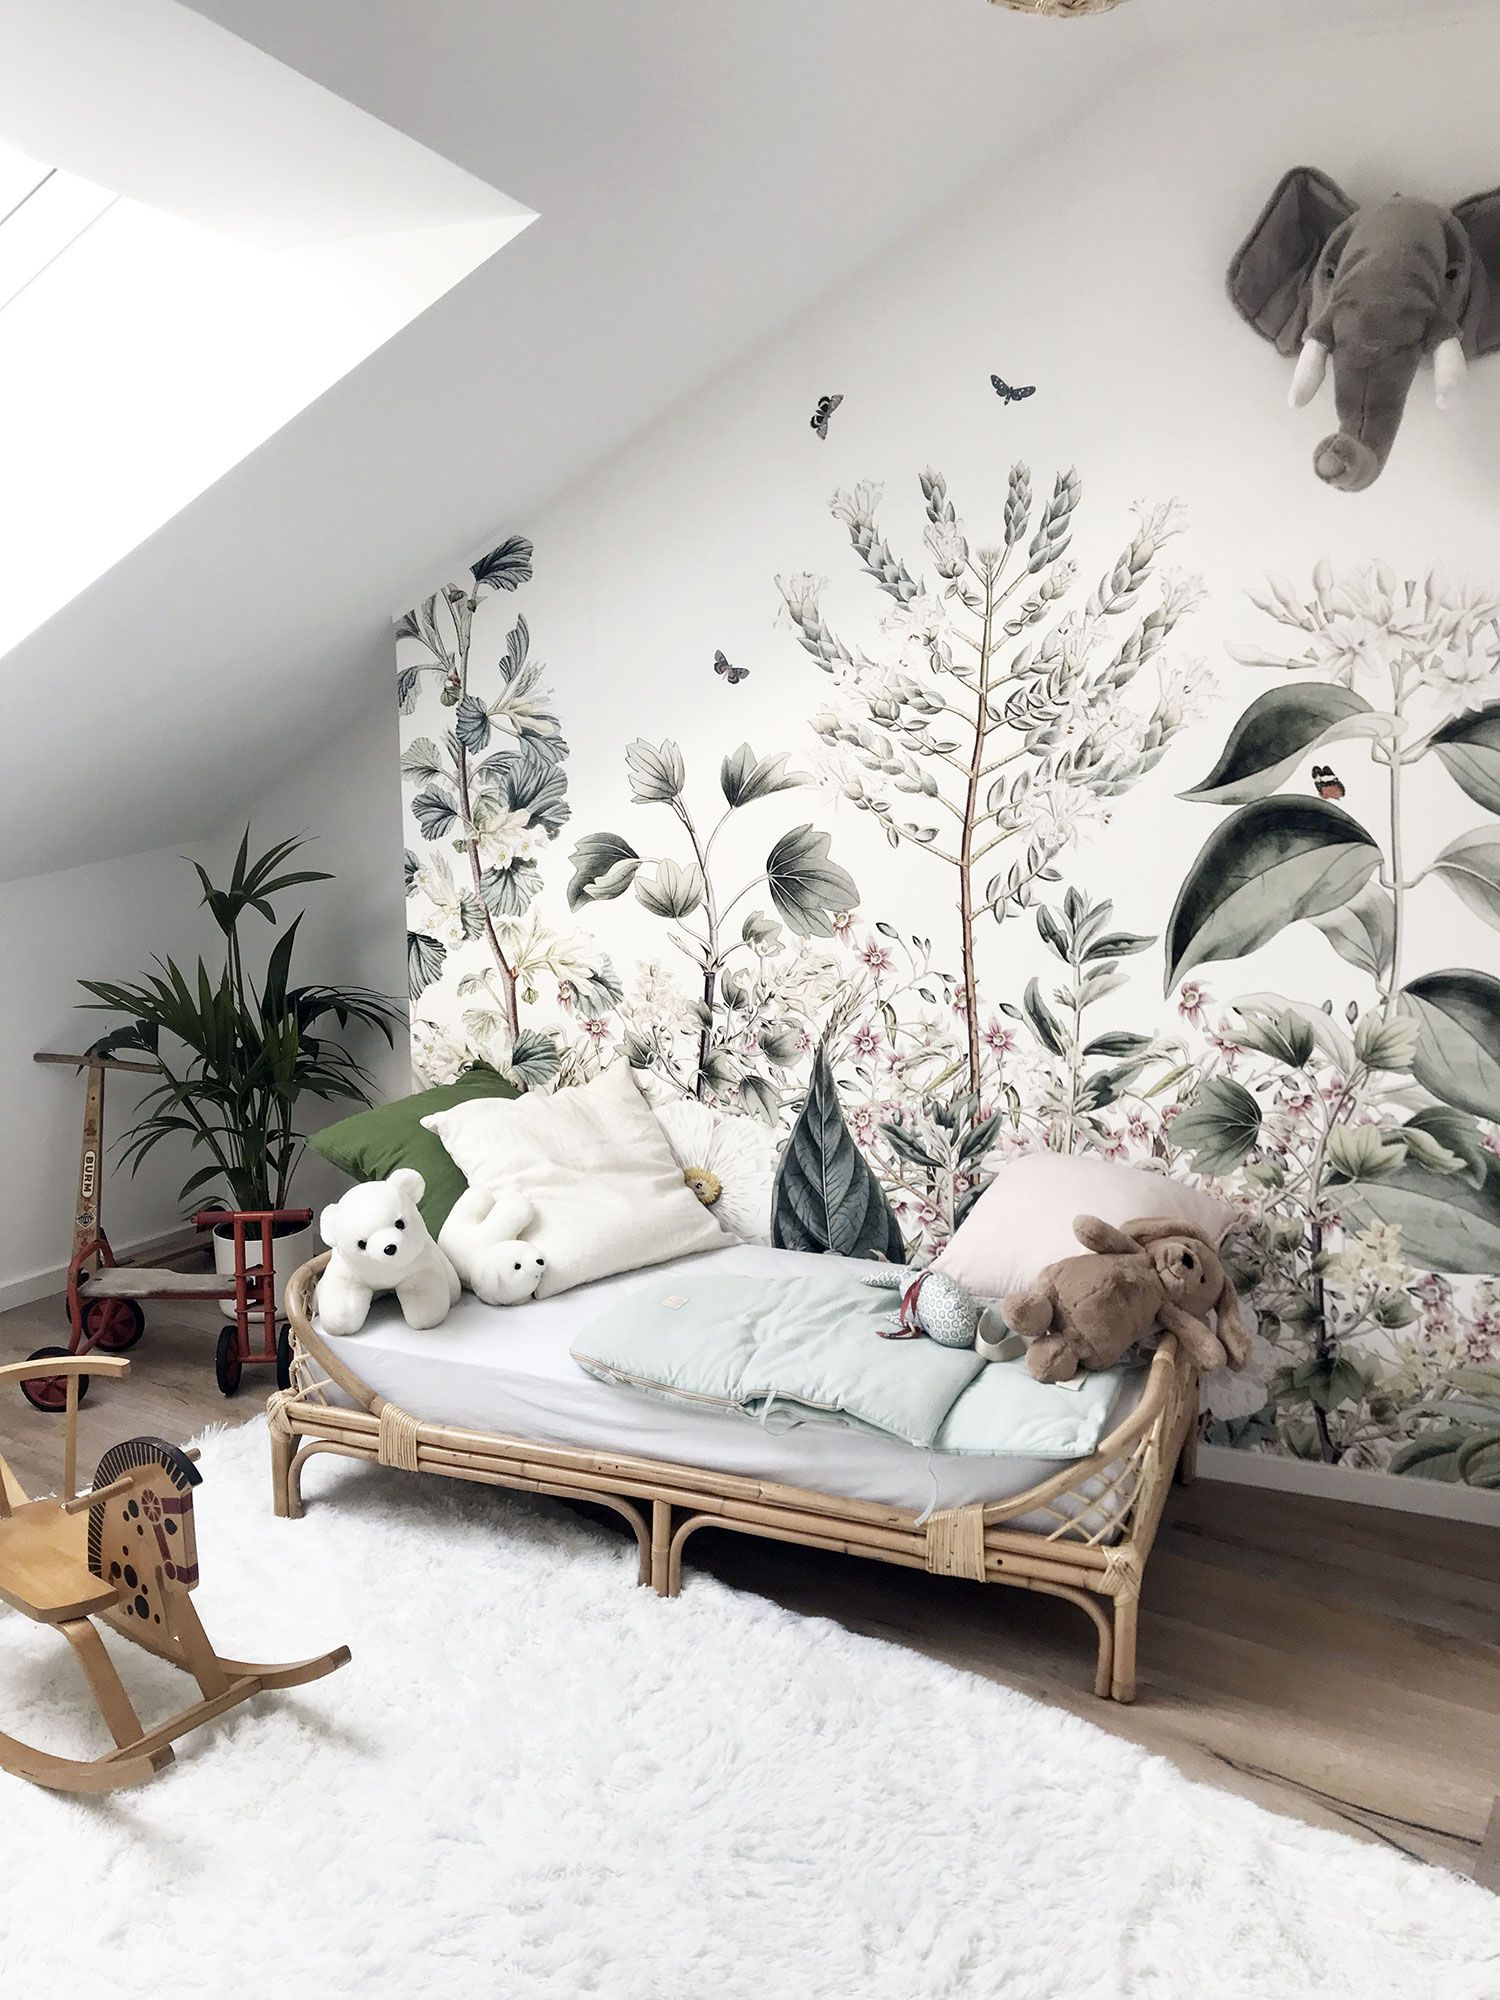 notre decor mural vegetal et fleuri